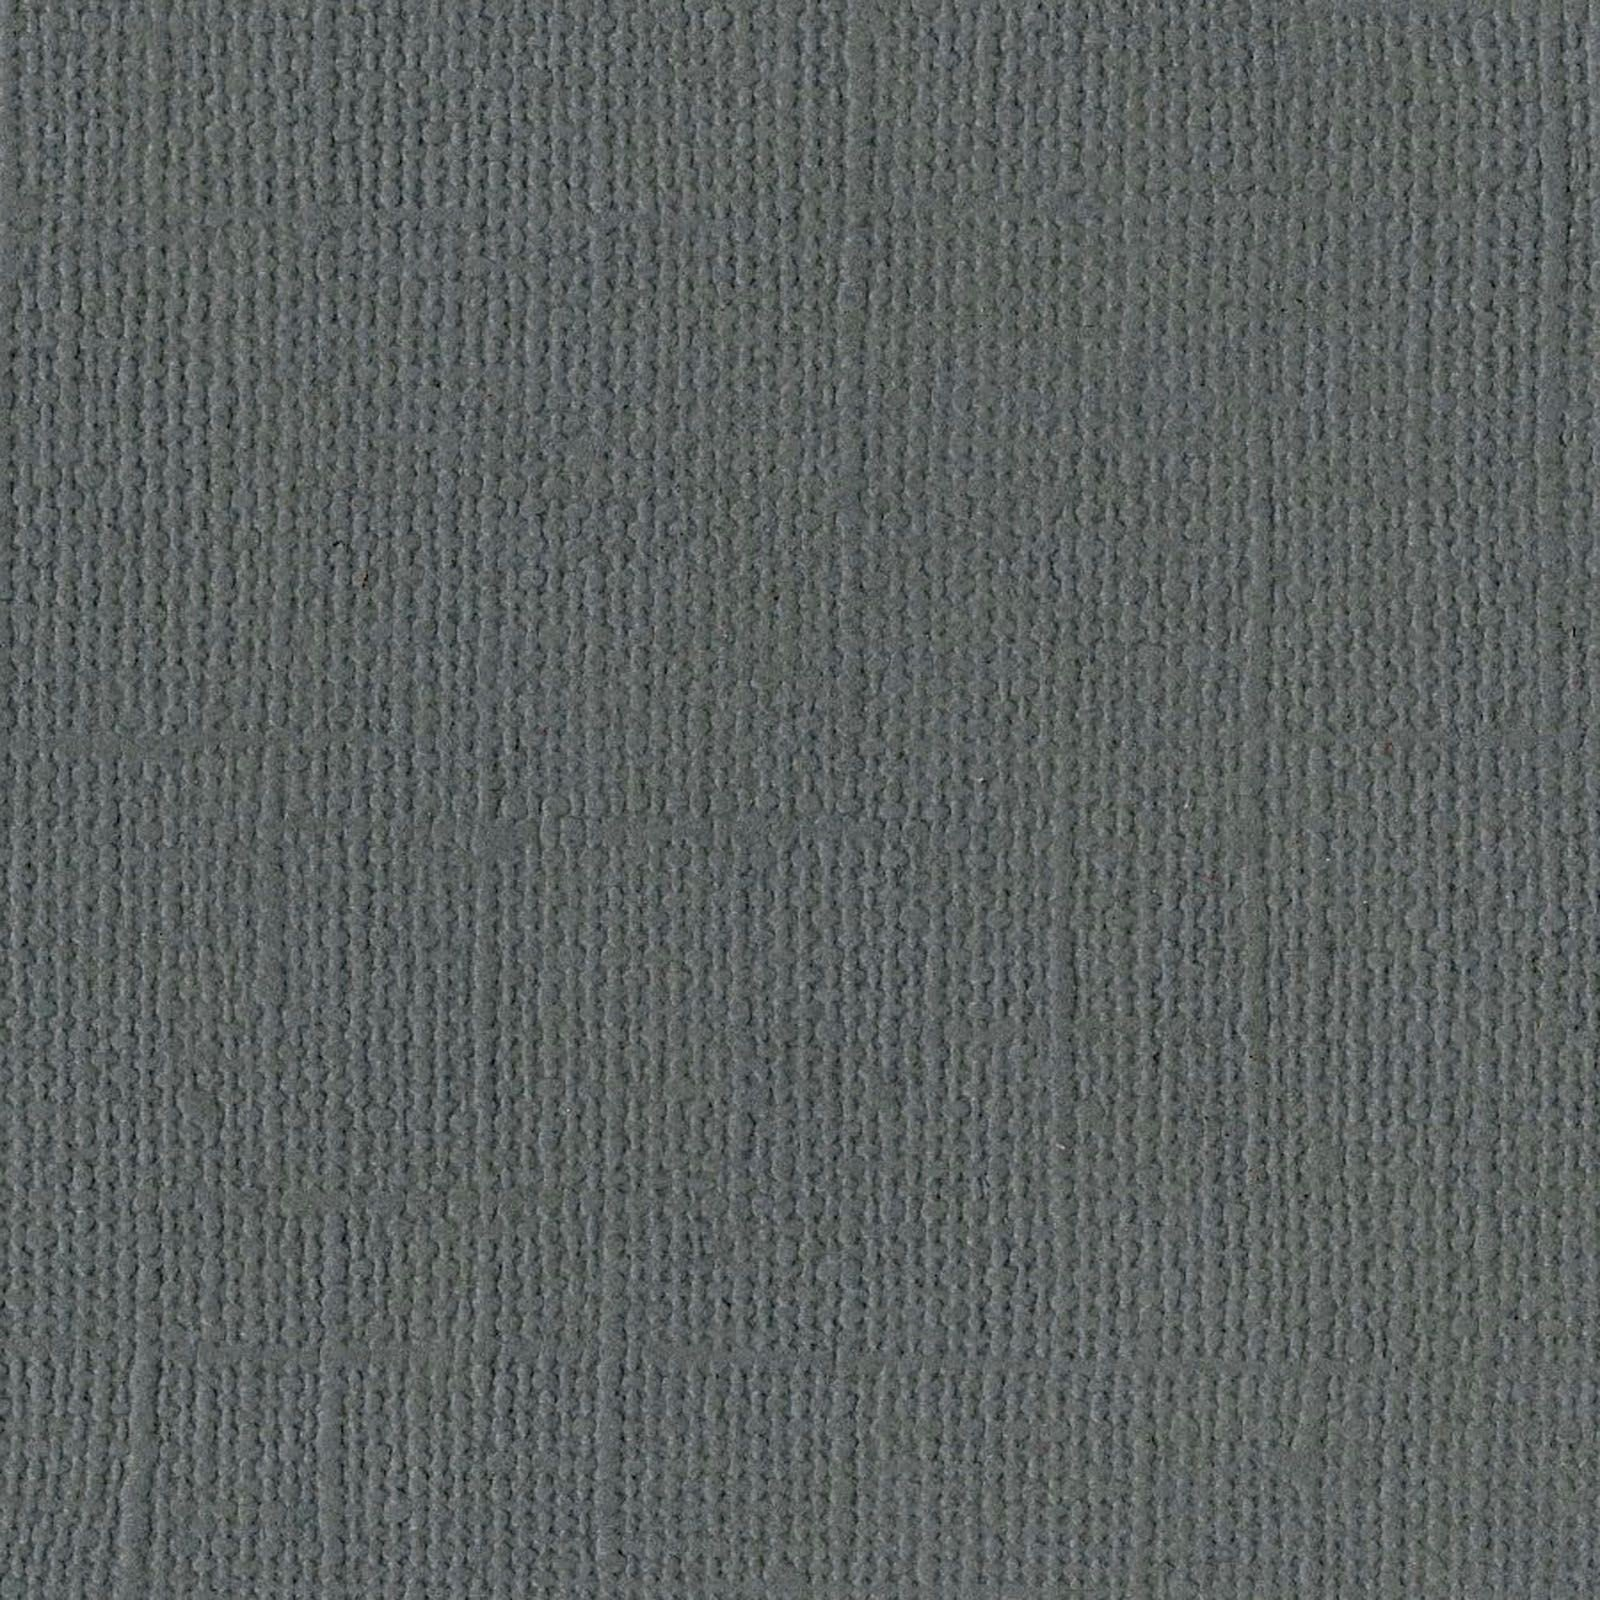 Cardstock - Ash/Canvas - Mono, 12x12 (Bazzill)